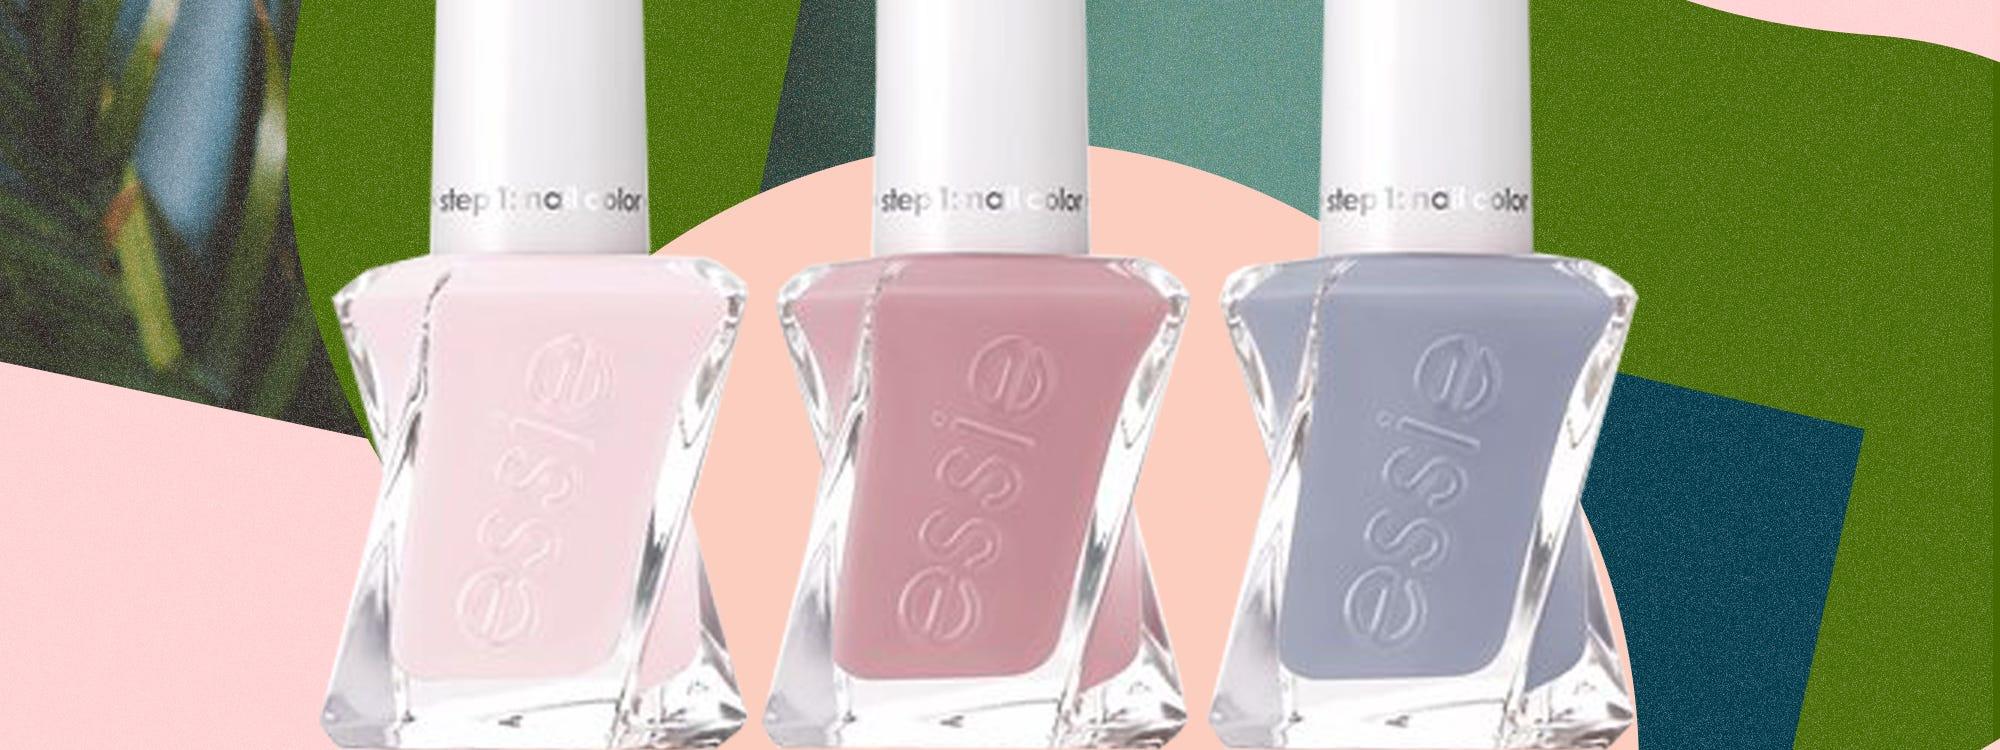 Meghan Markle Essie Enchanted Gel Couture Nail Polish